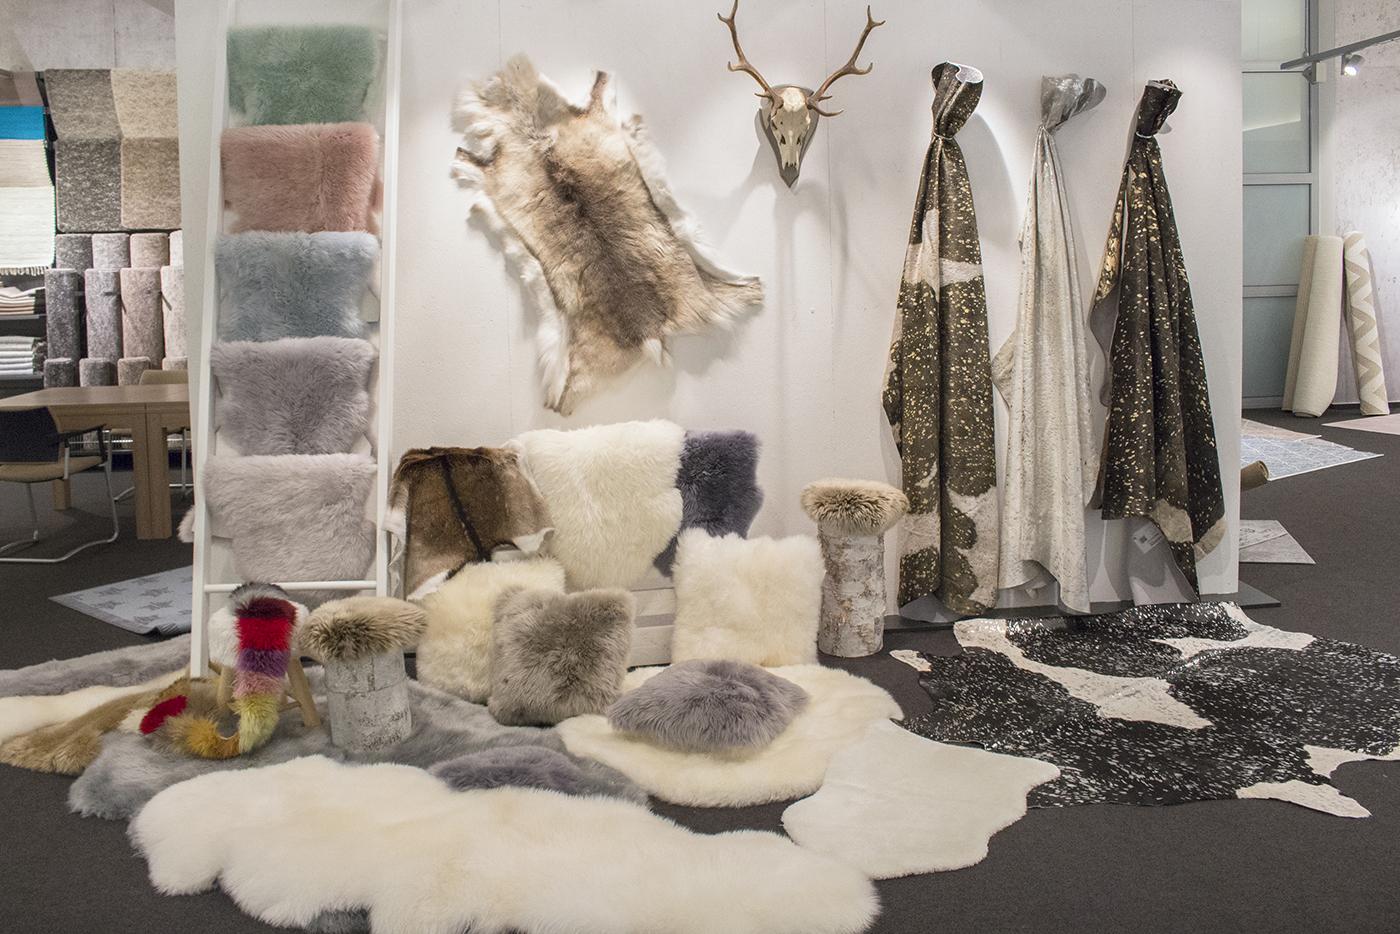 In house exhibition 2016 impressions reinkemeier - Reinkemeier rietberg ...